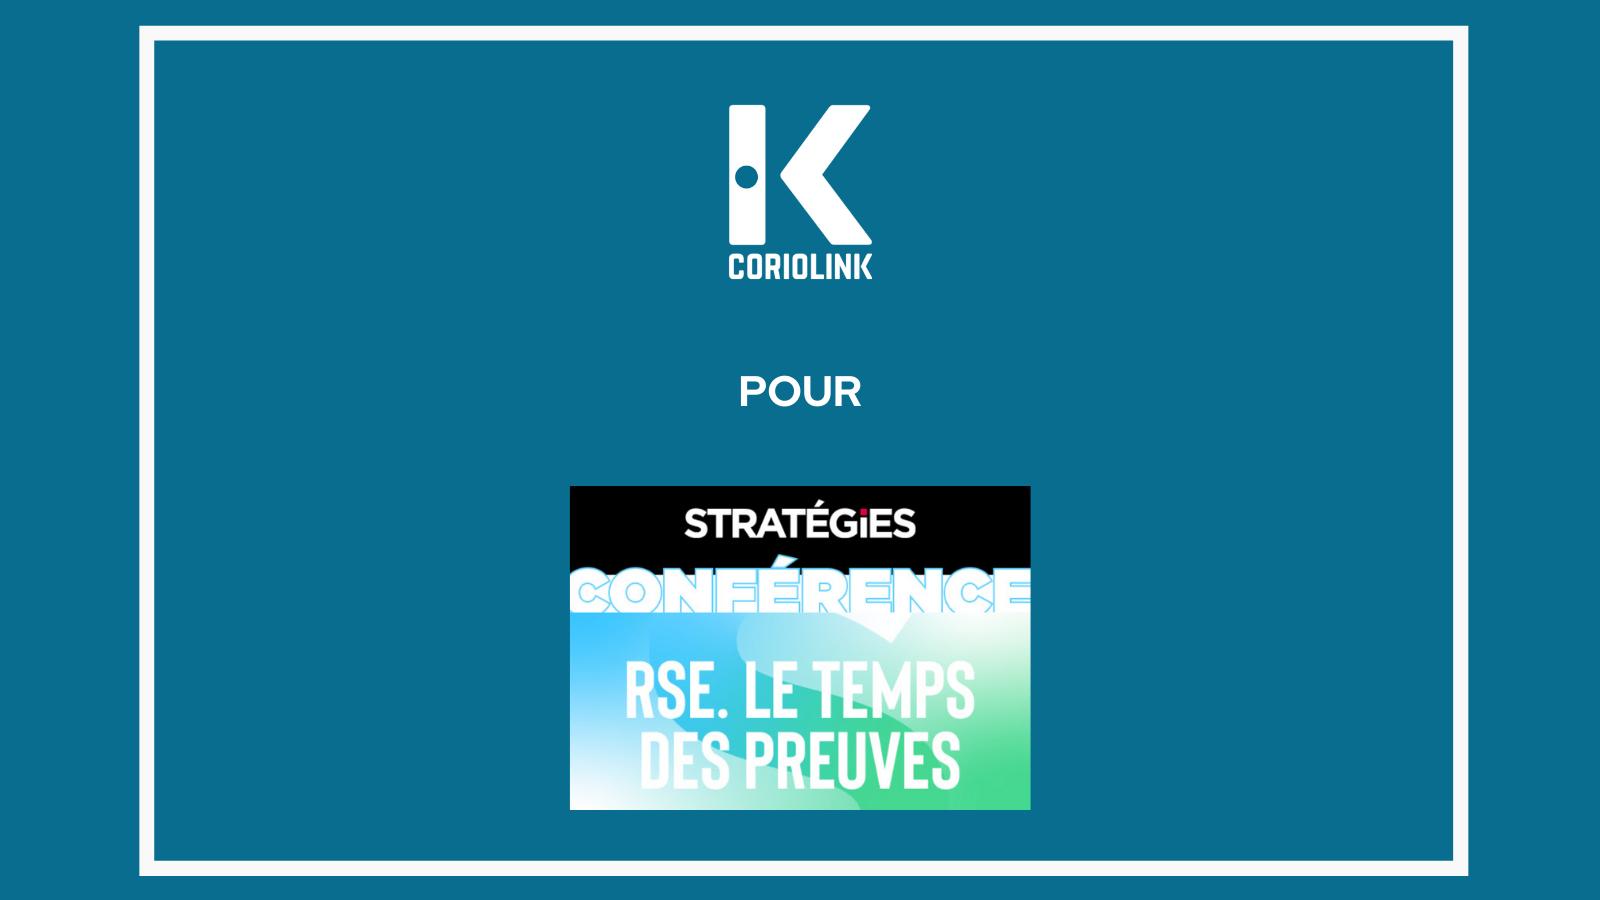 Stratégie RSE